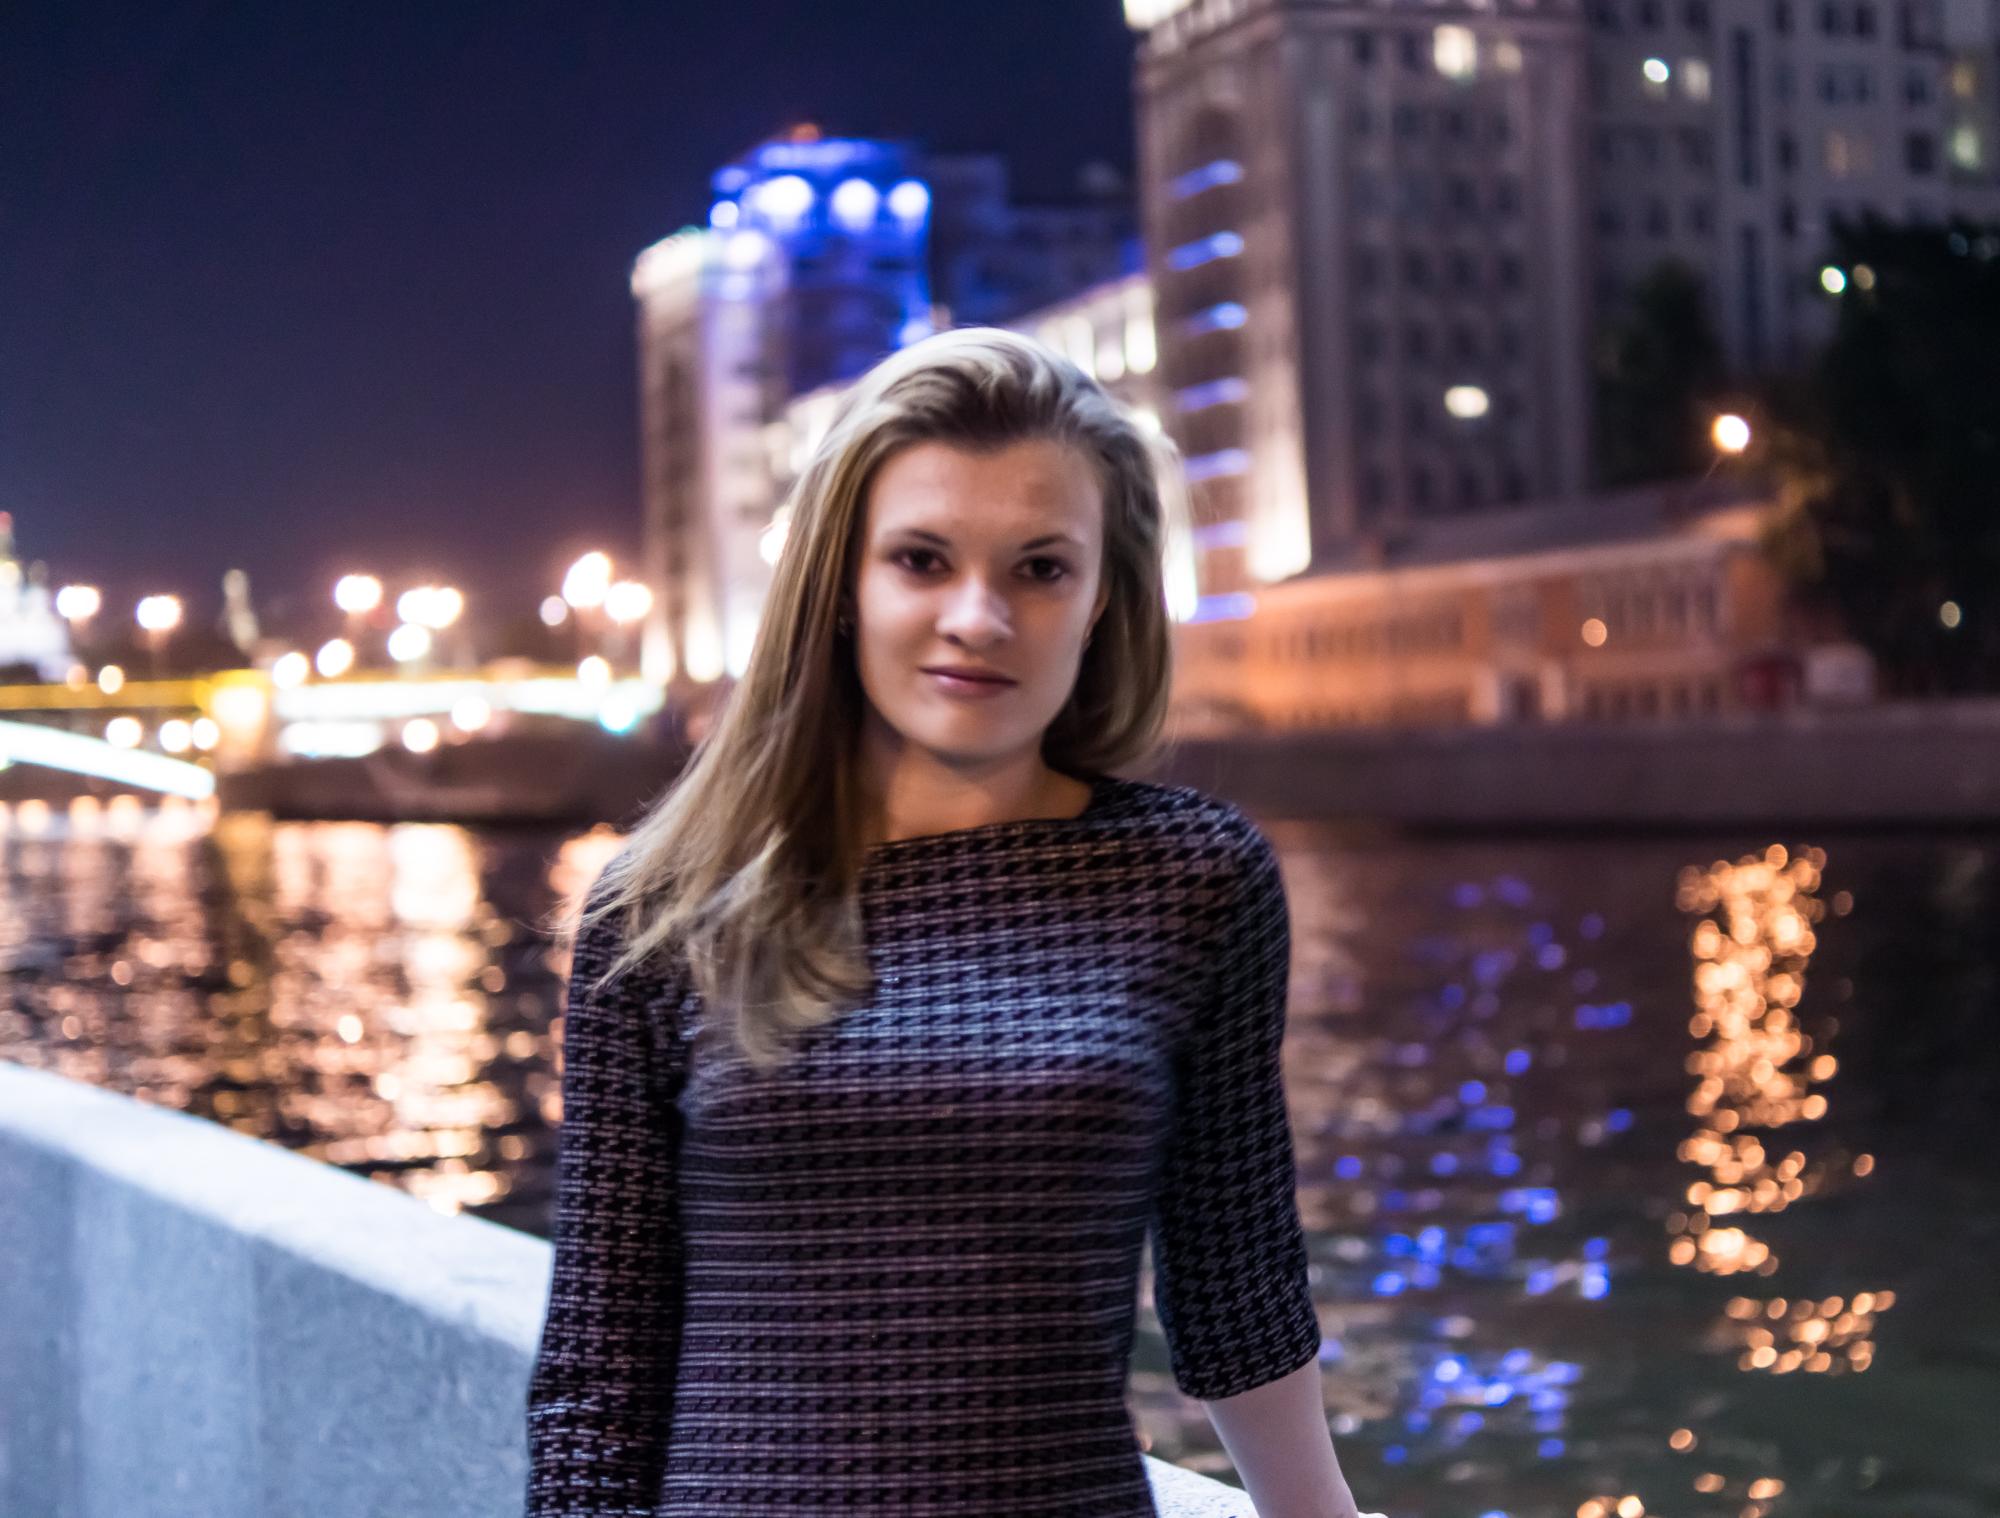 Amateurfotografie in Moskau